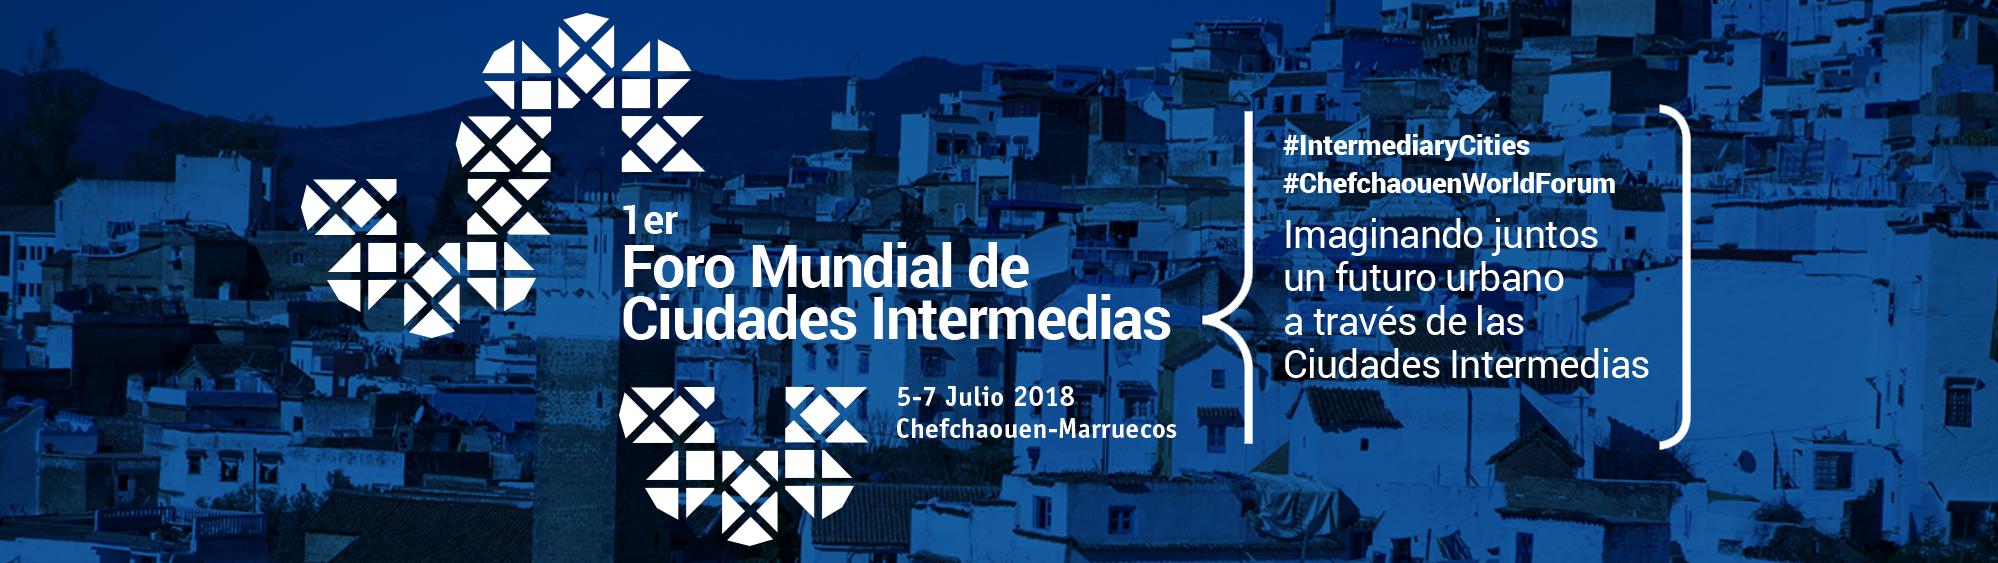 intermediary cities 2018